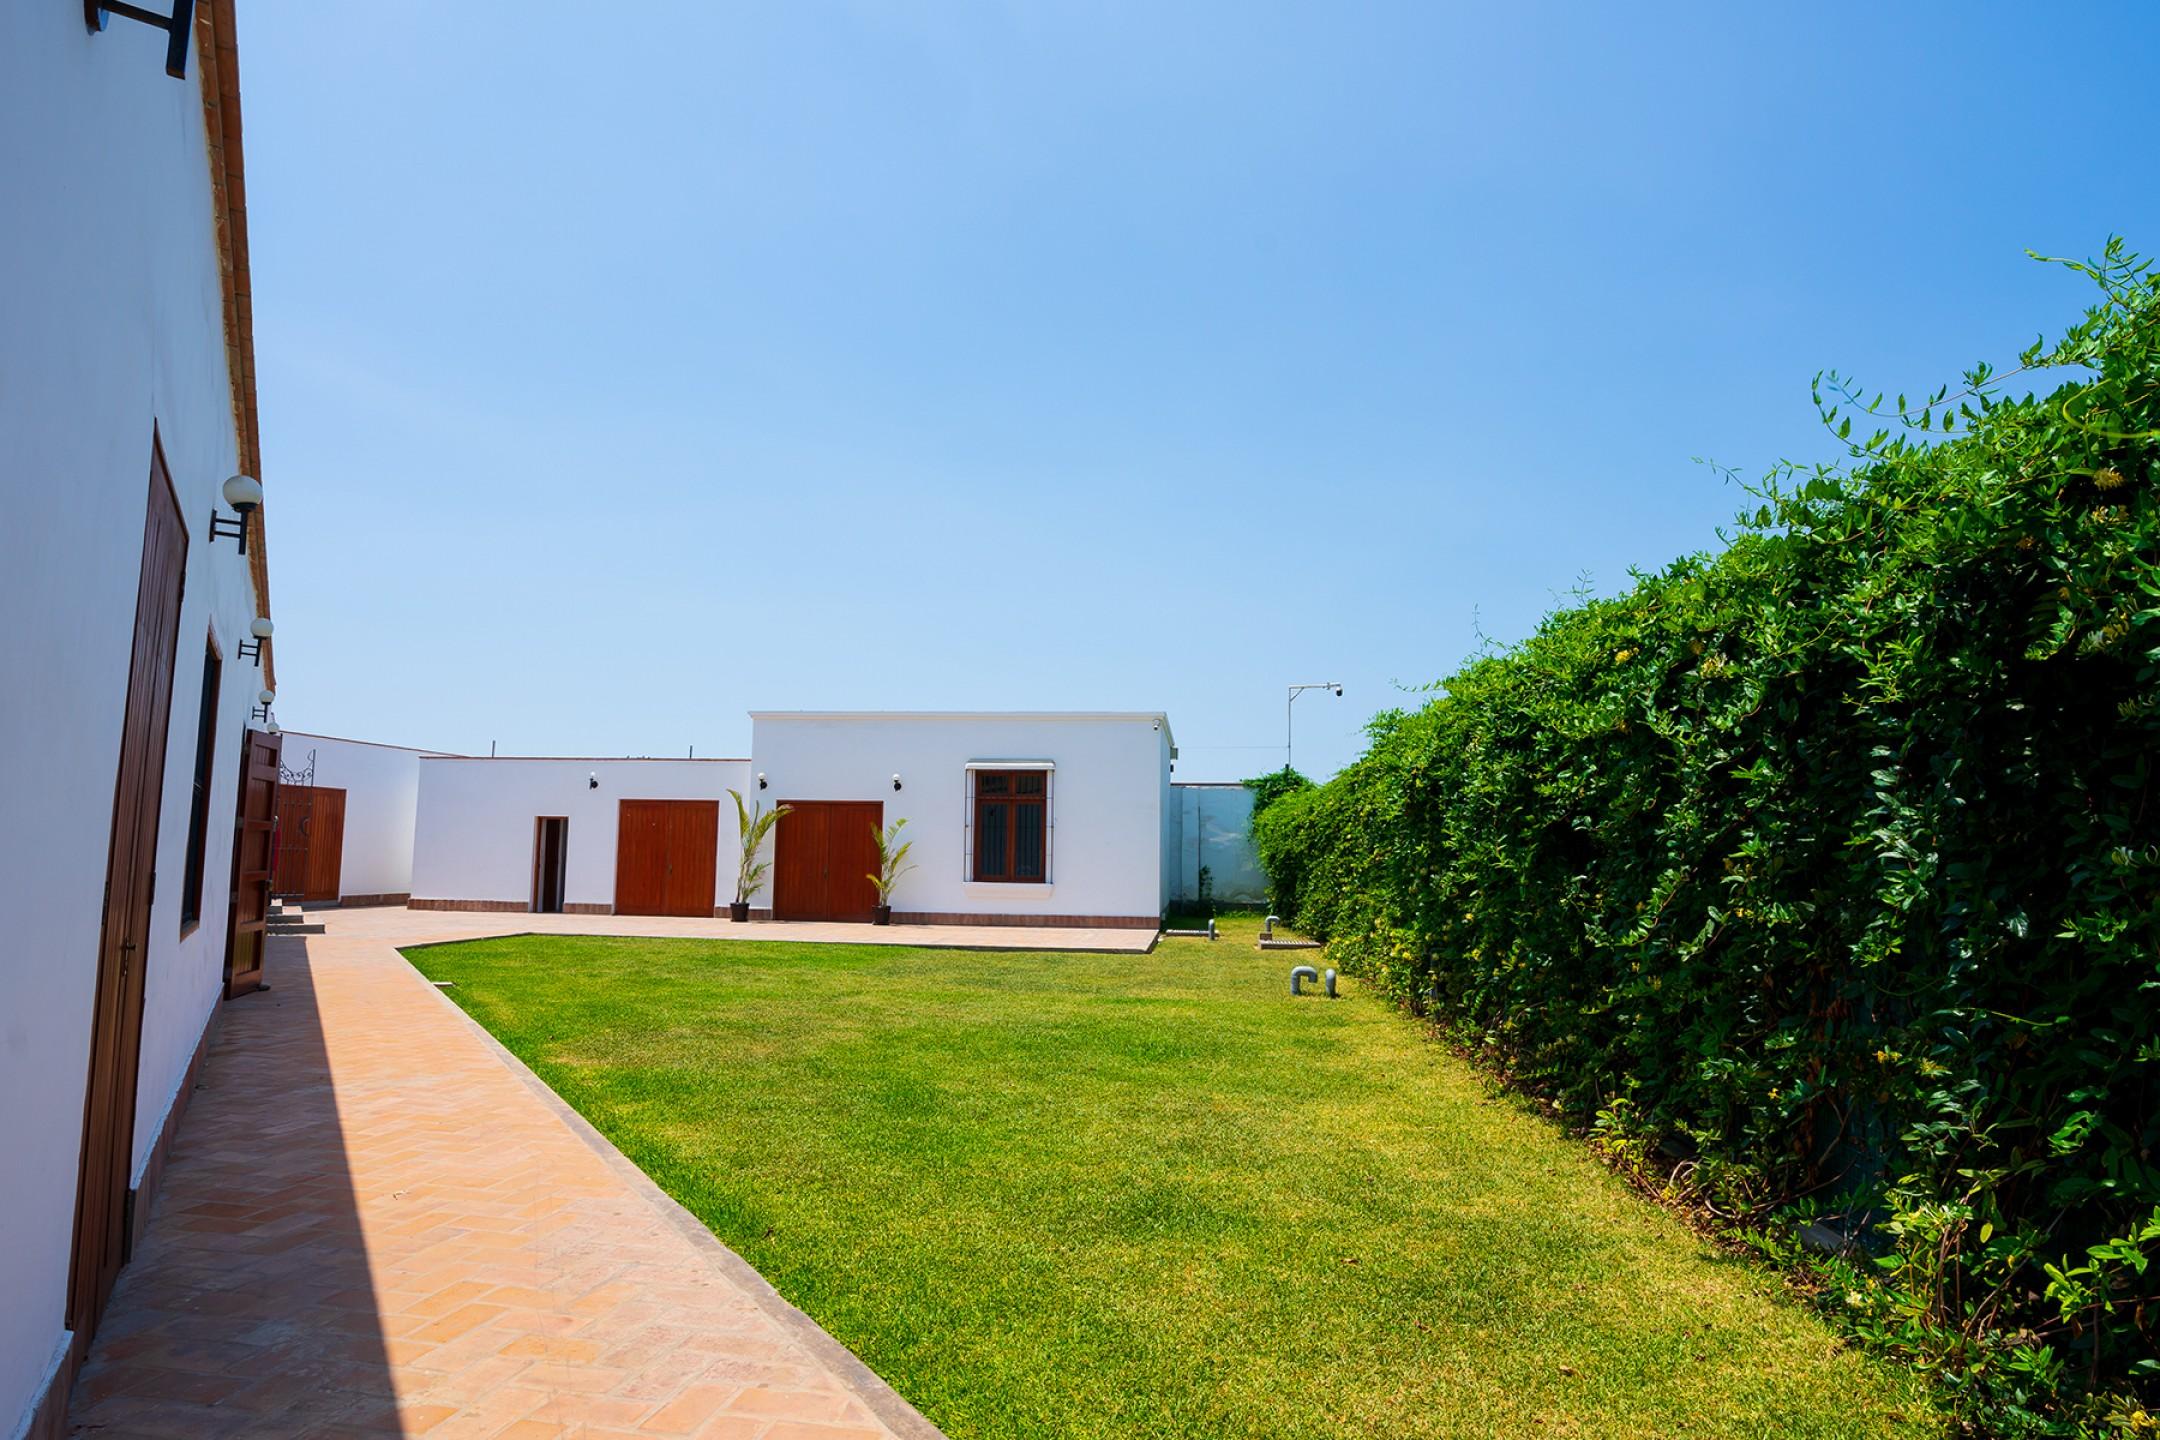 http://haciendabocanegra.com/images/chbn_PvsPp1131O_large-1080_gzwVM.jpg